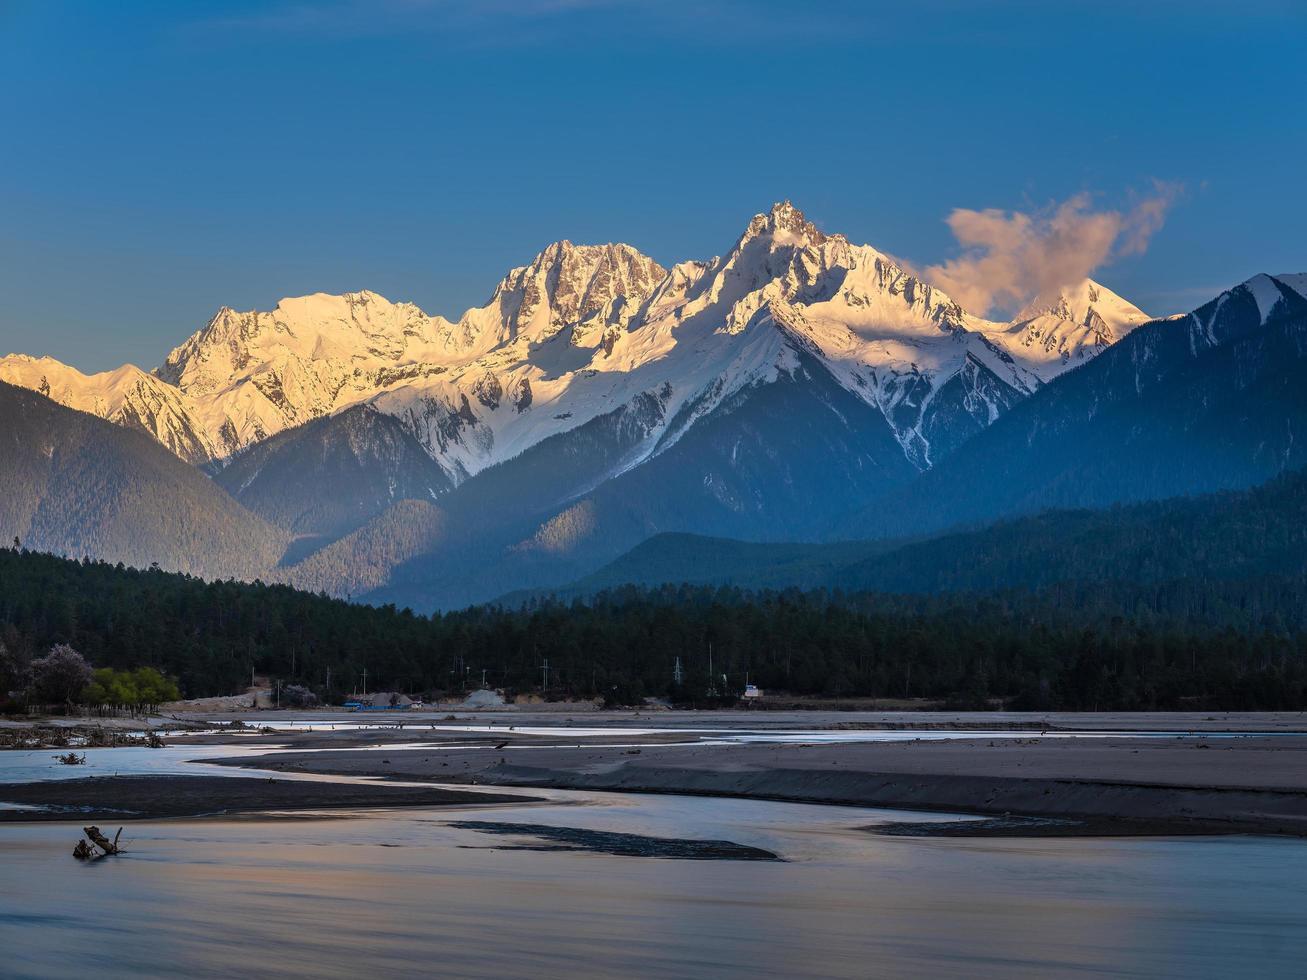 View of Himalayan mountains photo